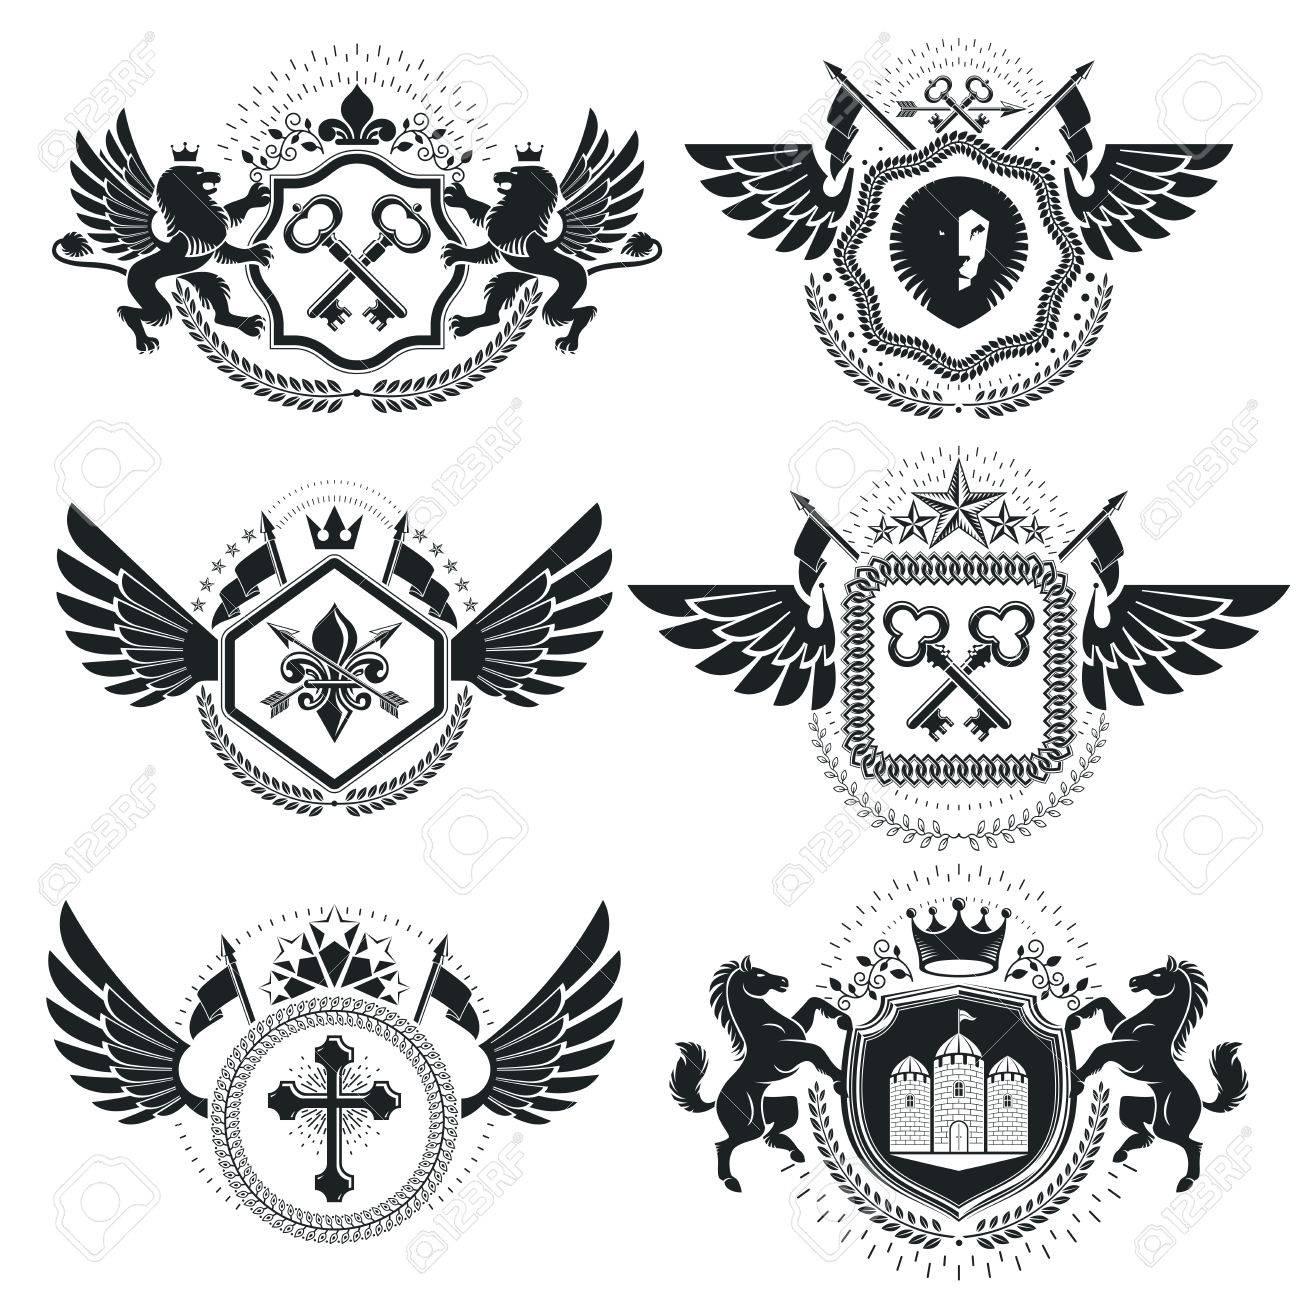 Heraldic coat of arms decorative emblems collection of symbols heraldic coat of arms decorative emblems collection of symbols in vintage style stock vector biocorpaavc Images